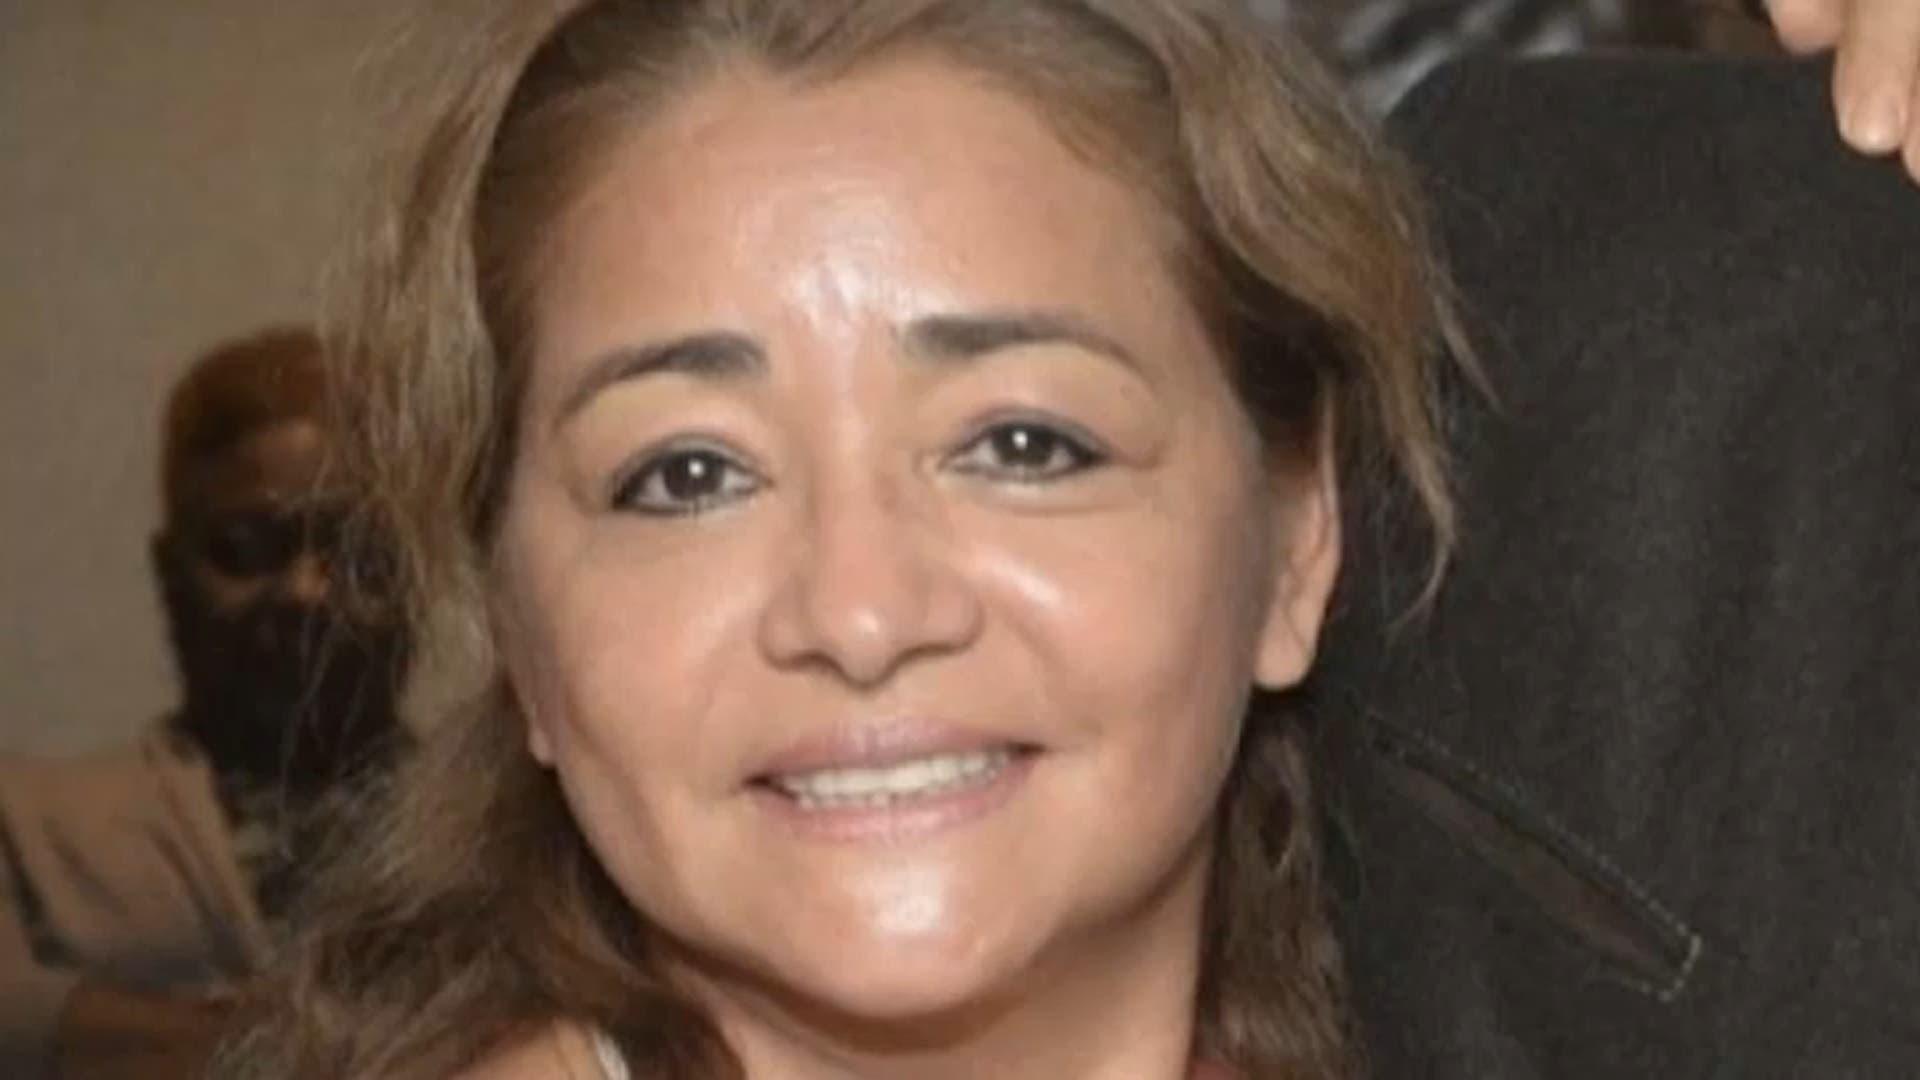 Marina Fuentes